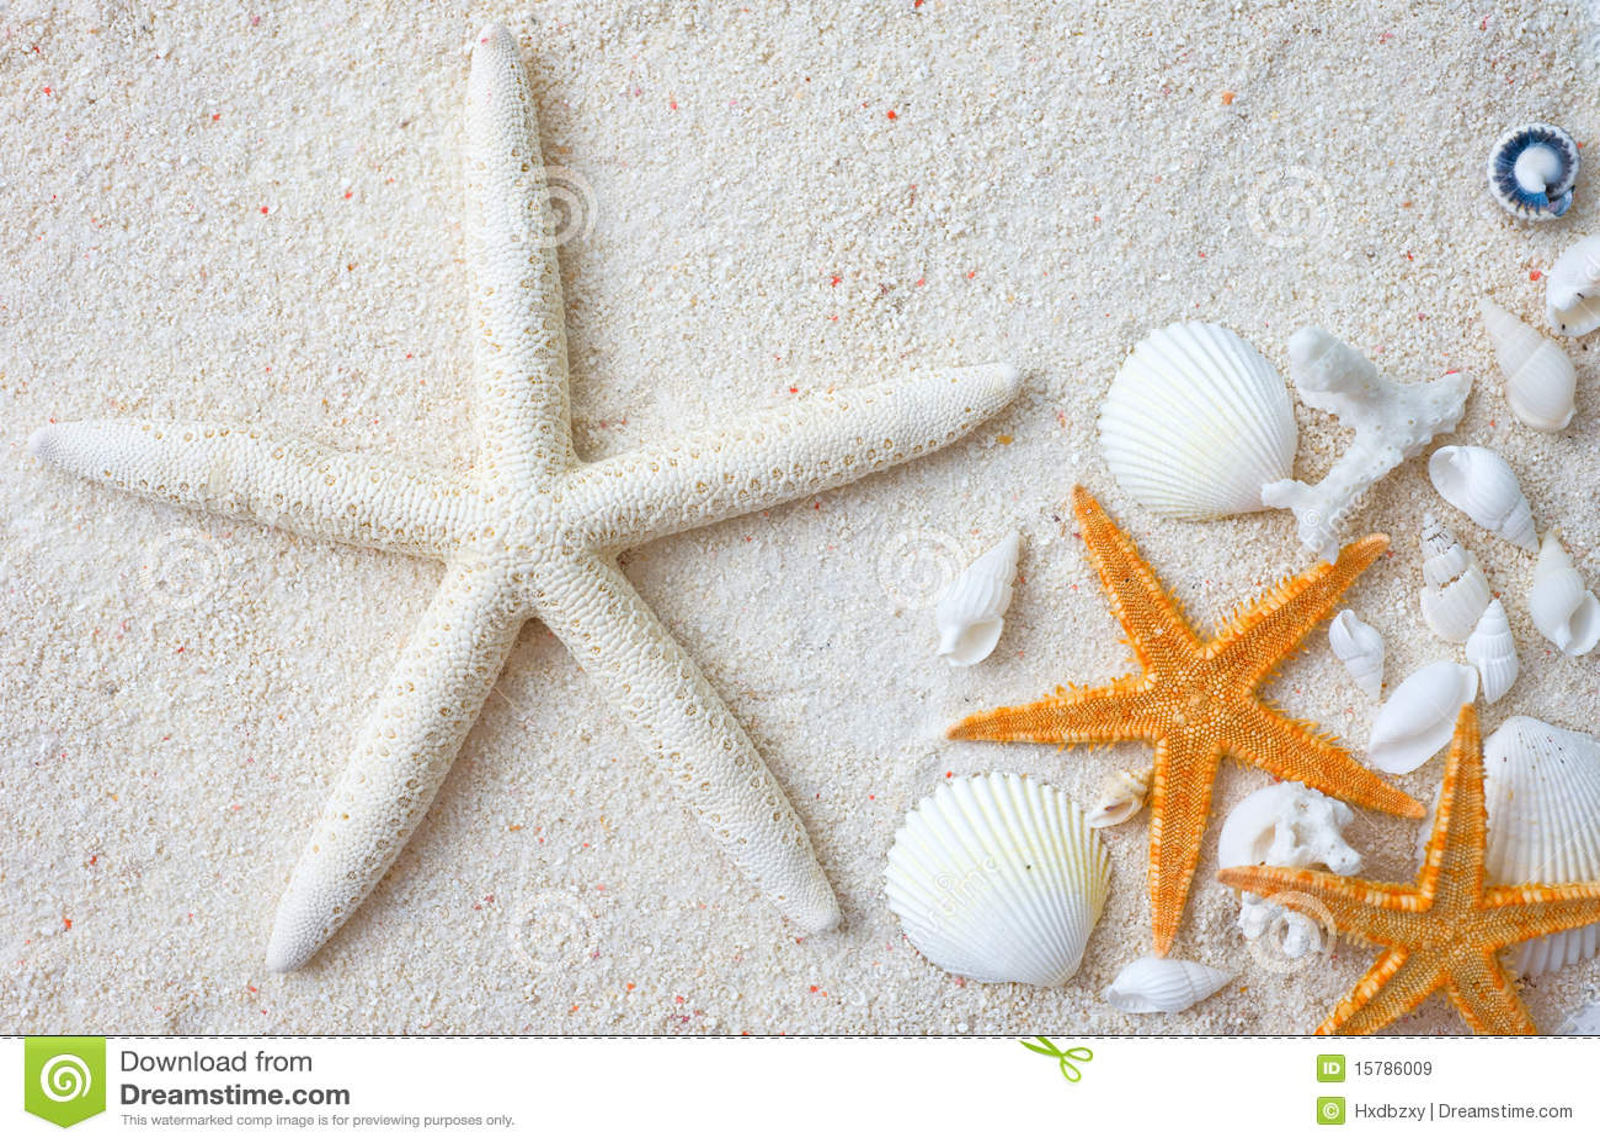 royalty free stock images seashells starfish image